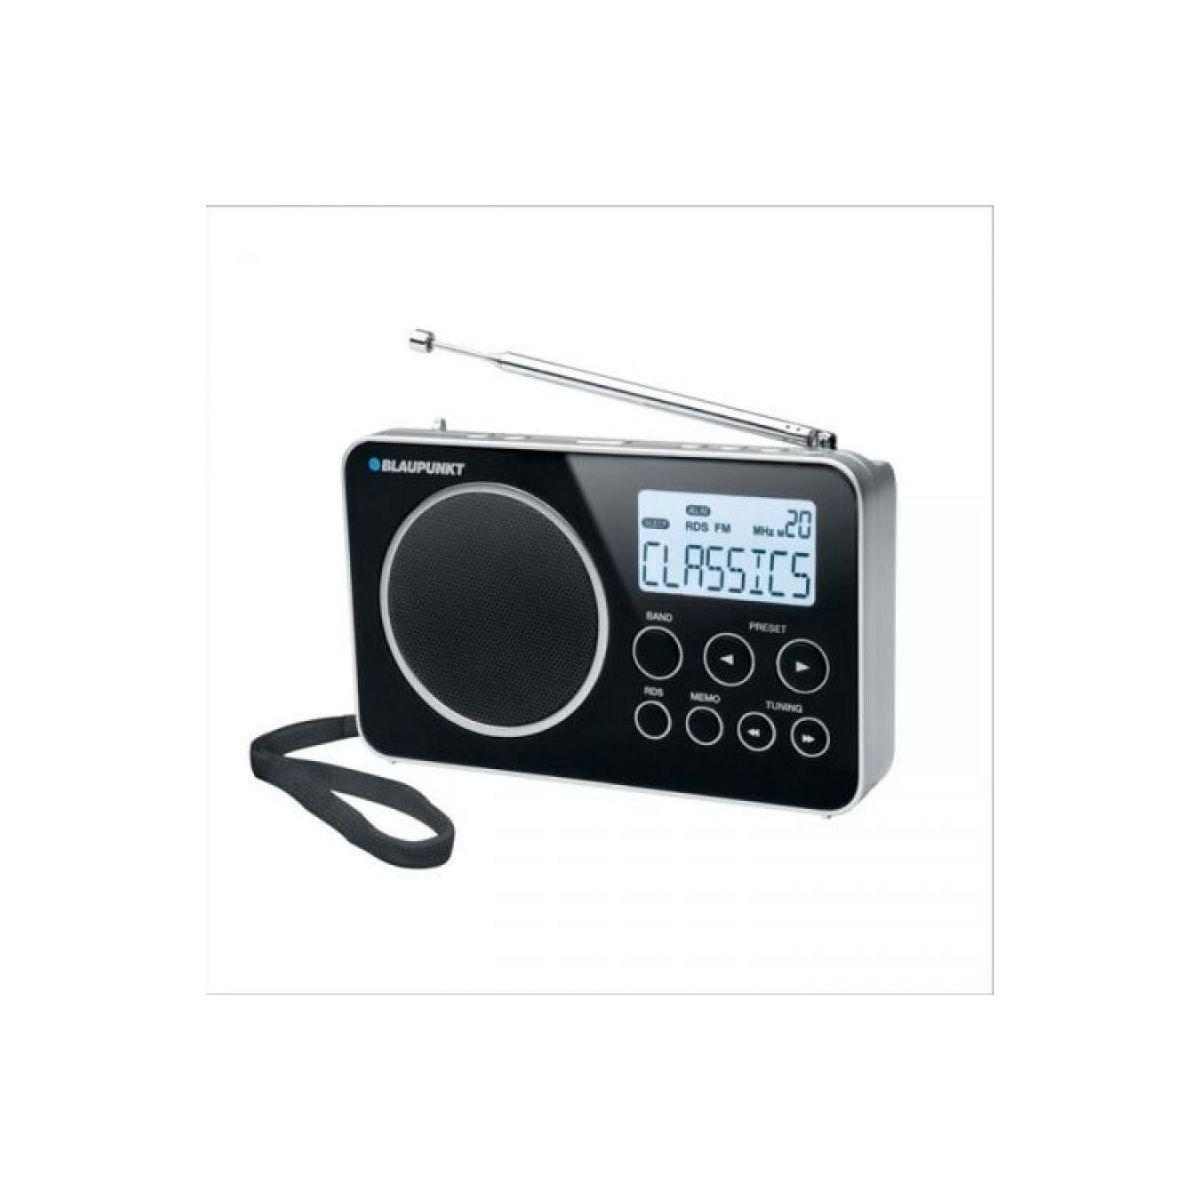 Radio analogique blaupunkt bdr-500 - 2% de remise imm?diate av...